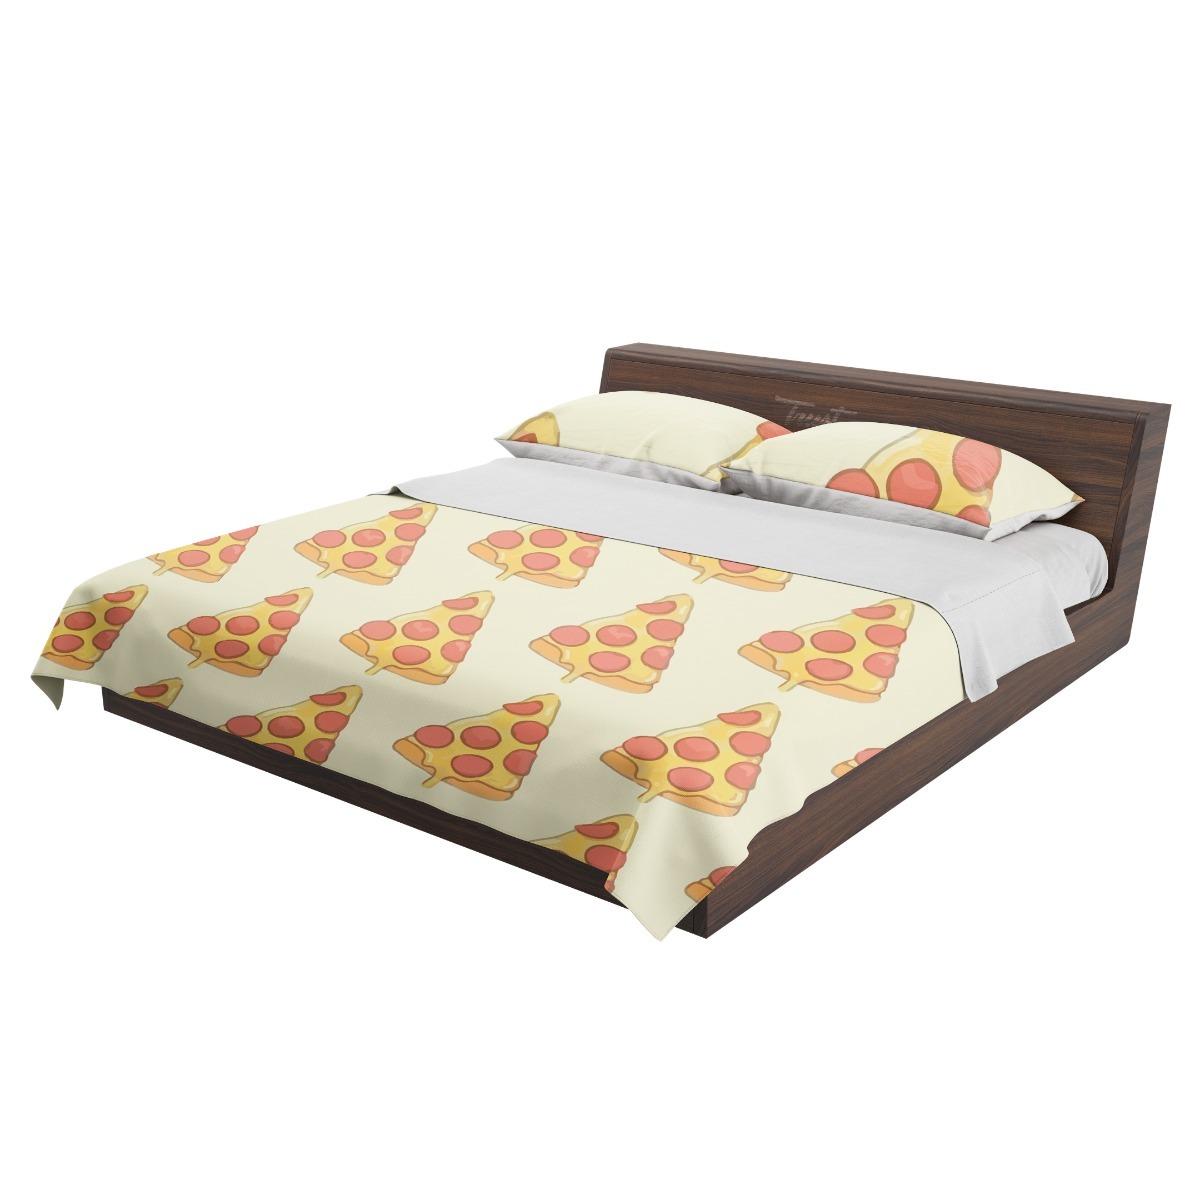 e2fe64fe0d jogo cama casal pizza kawaii food cute fofo comida vintage. Carregando zoom.